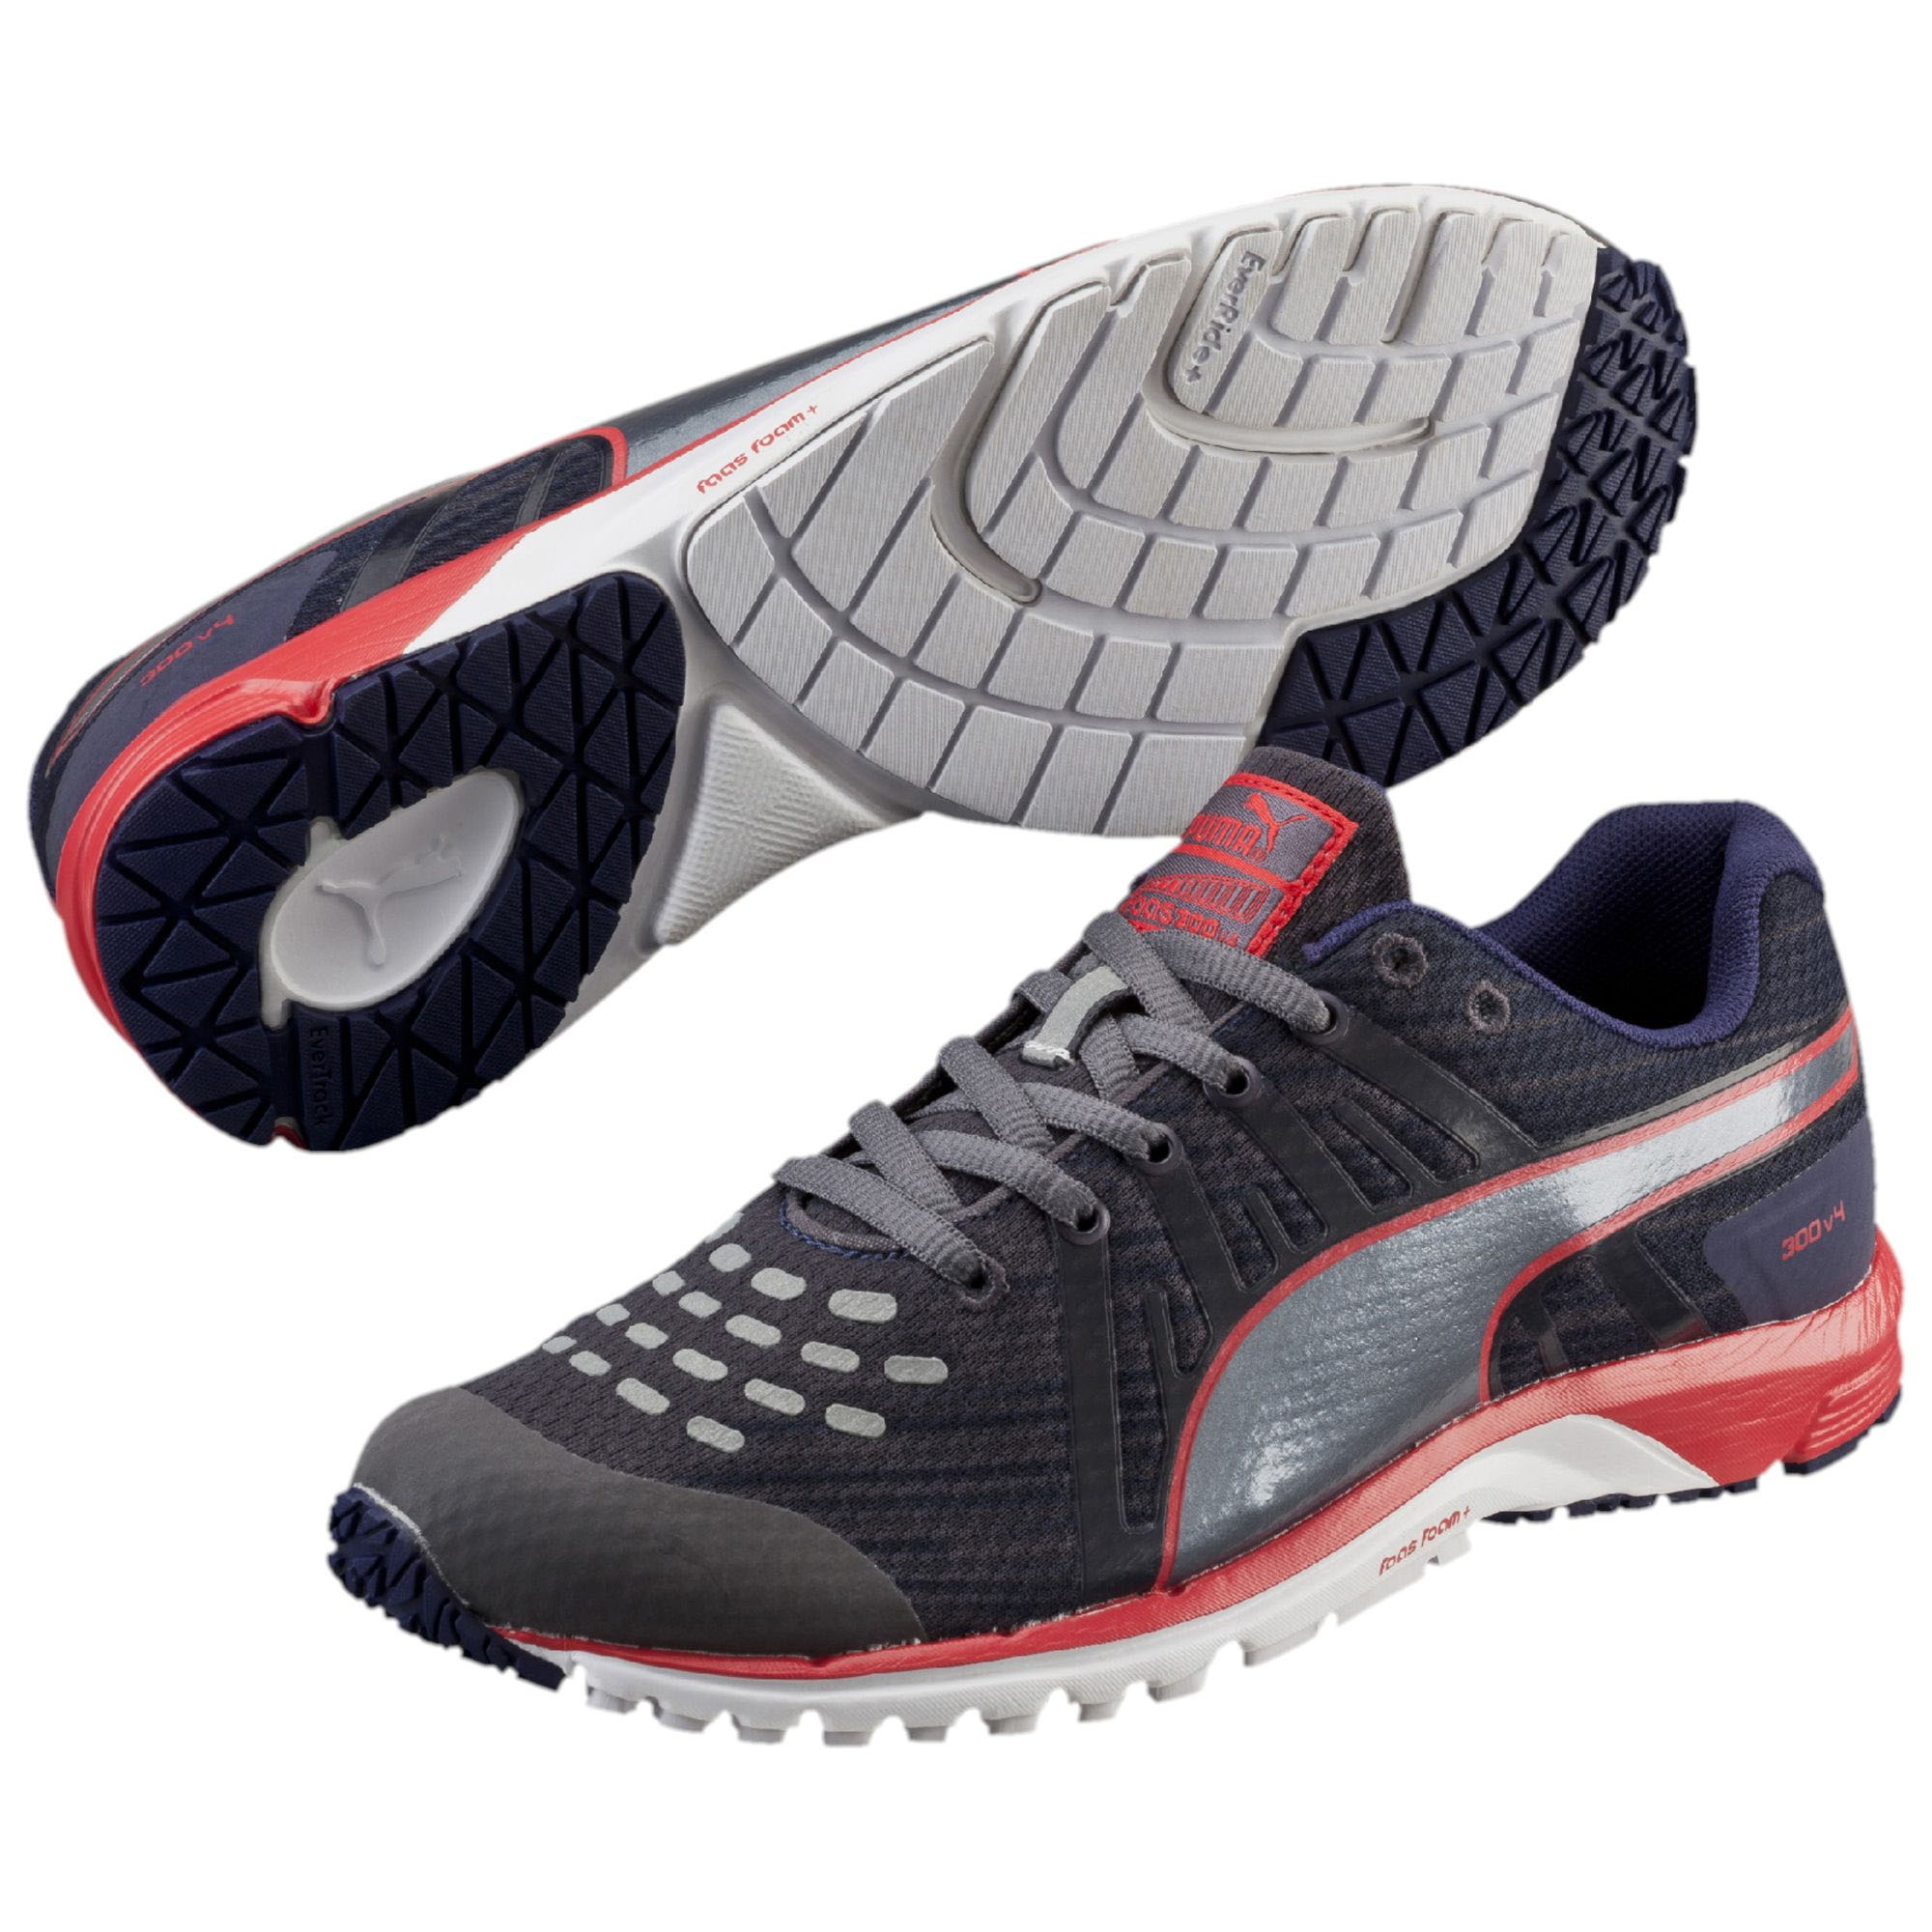 Puma Faas 300 V4 Ladies Running Shoes  7 UK